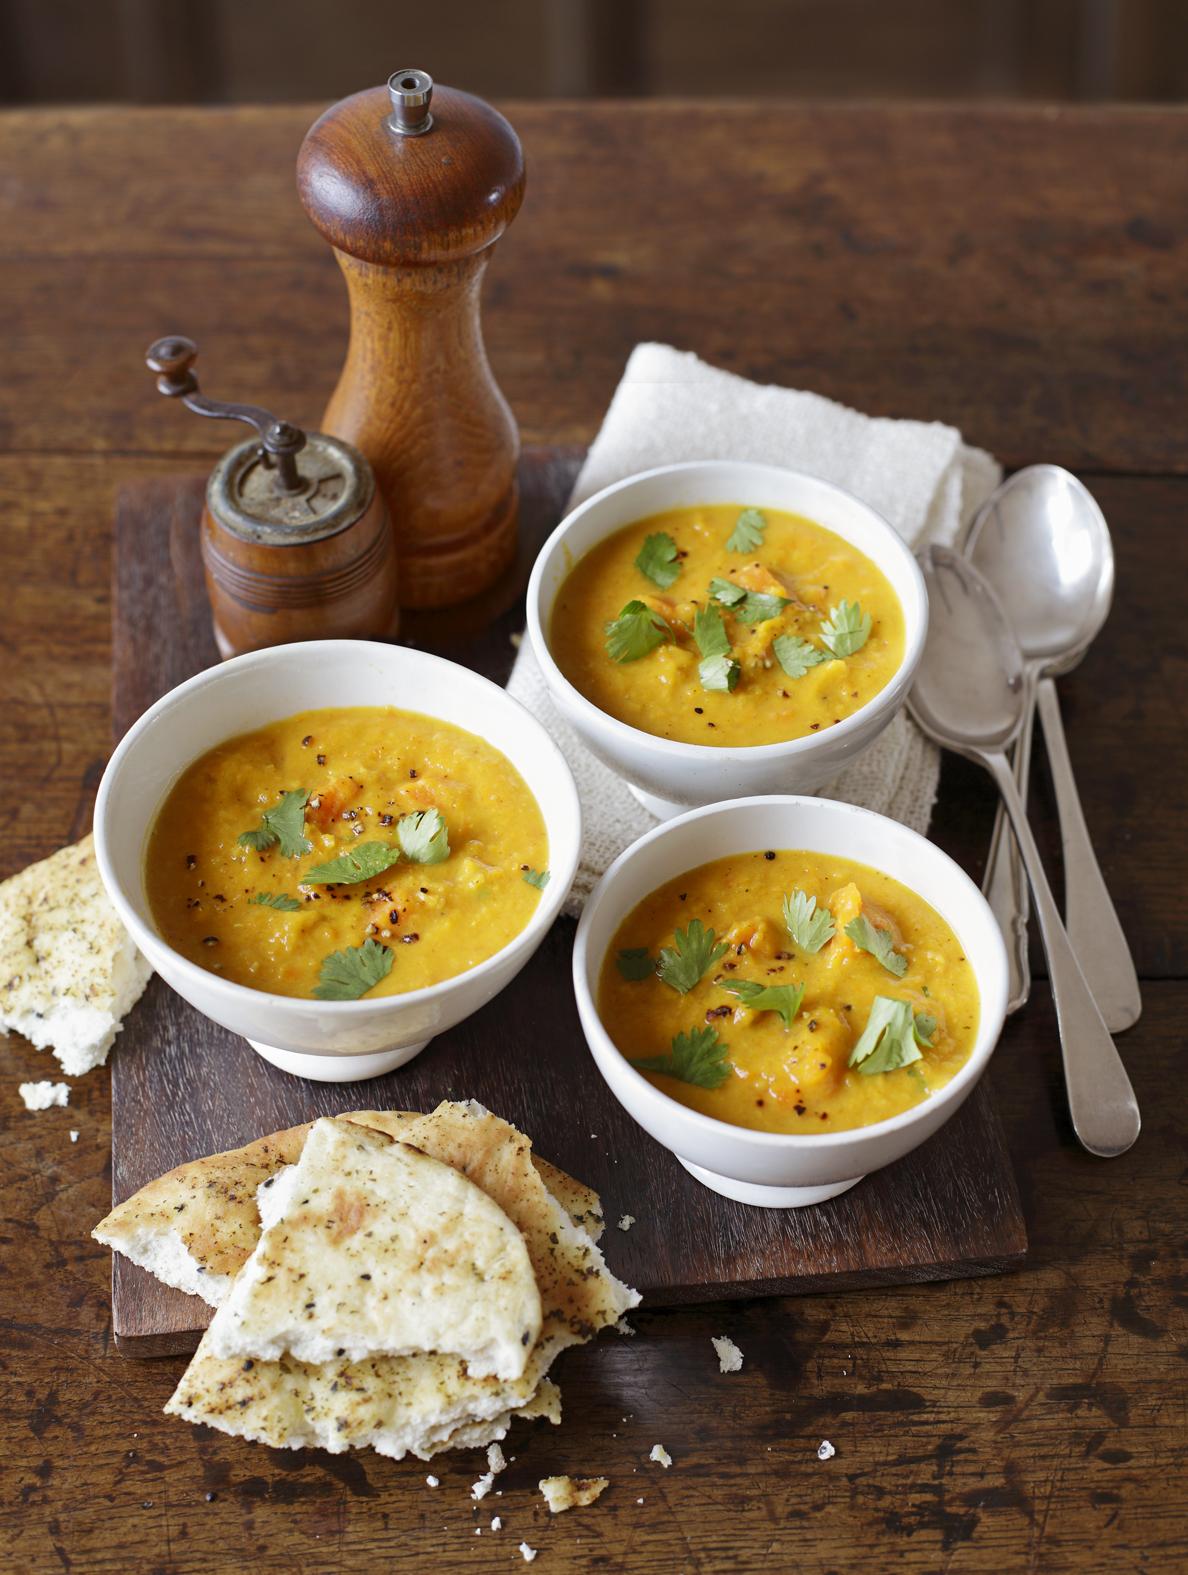 appledrane: Curried squash, lentil and coconut soup